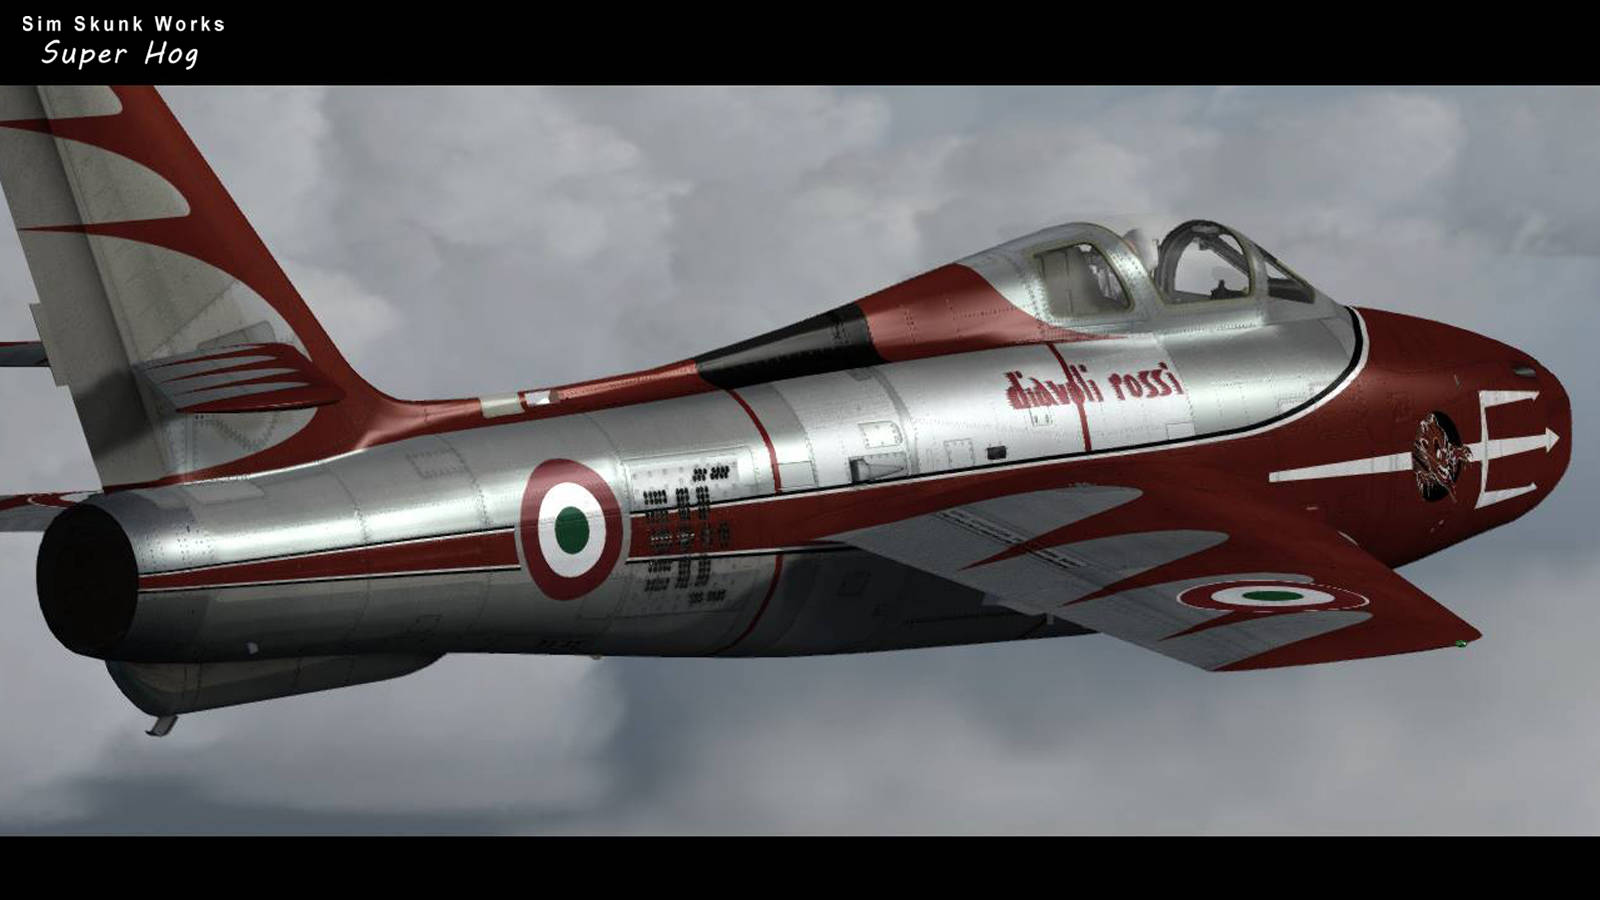 Just Flight - Sim Skunk Works F-84F 'Thunderstreak' (for P3D v4)